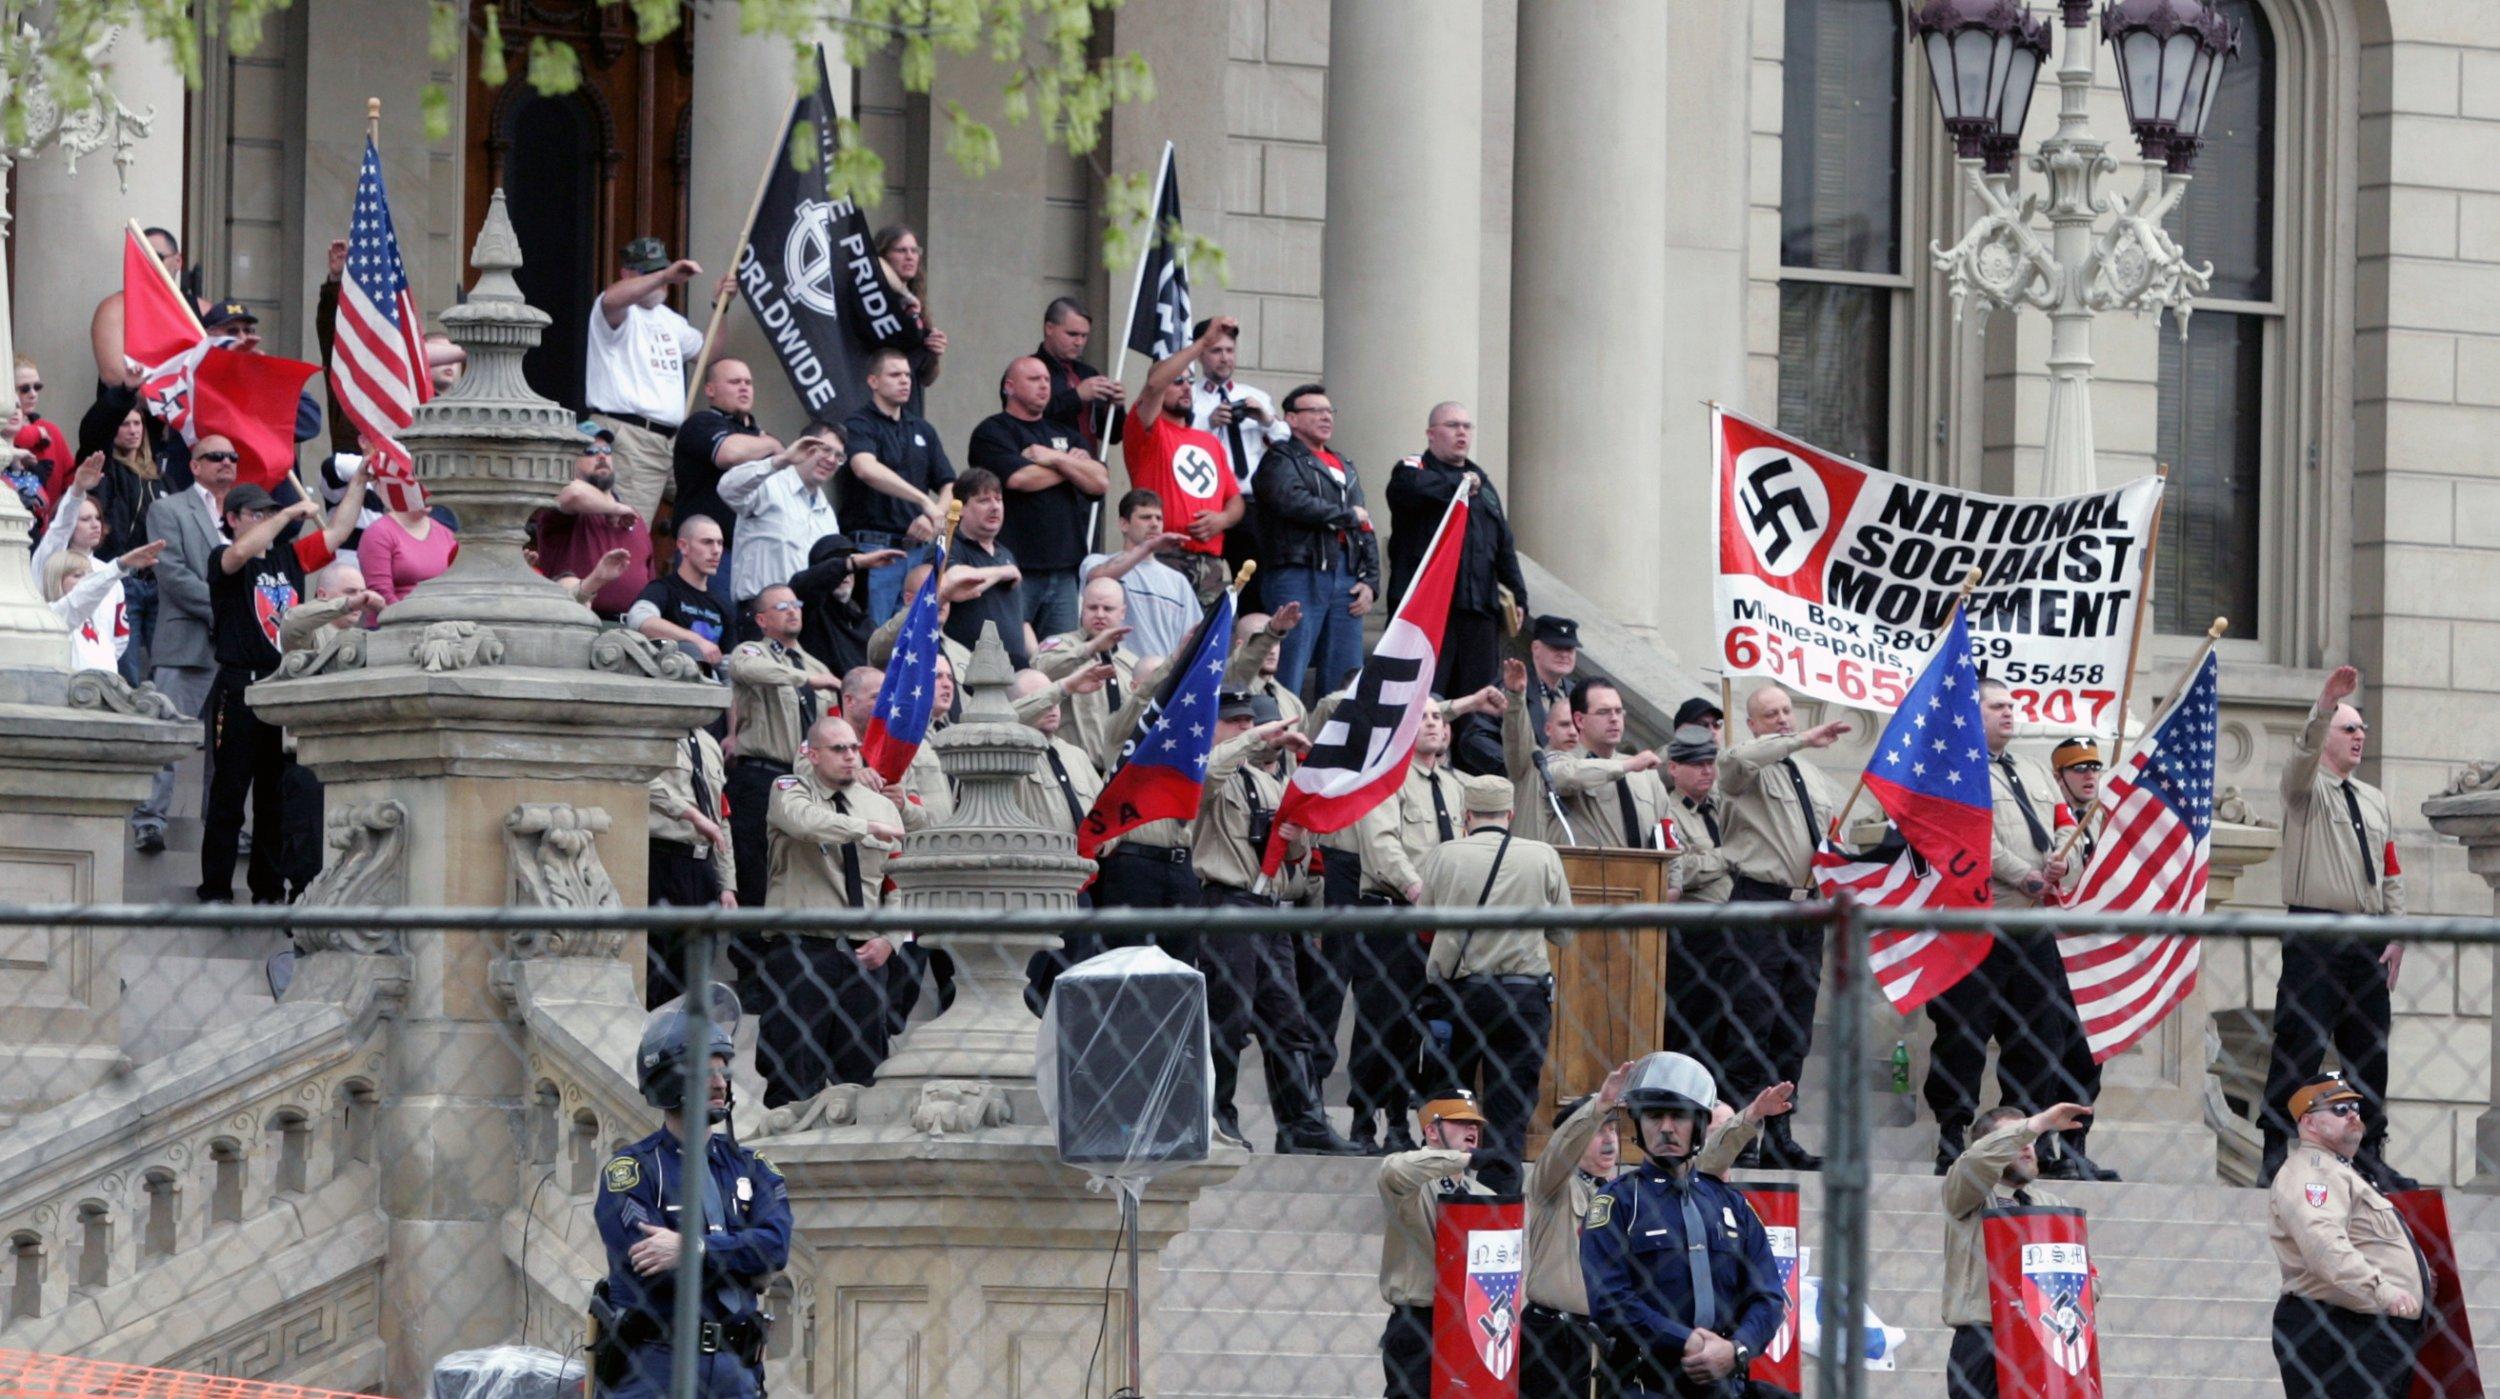 Neo-Nazis March in Georgia To Mark Hitler's Birthday